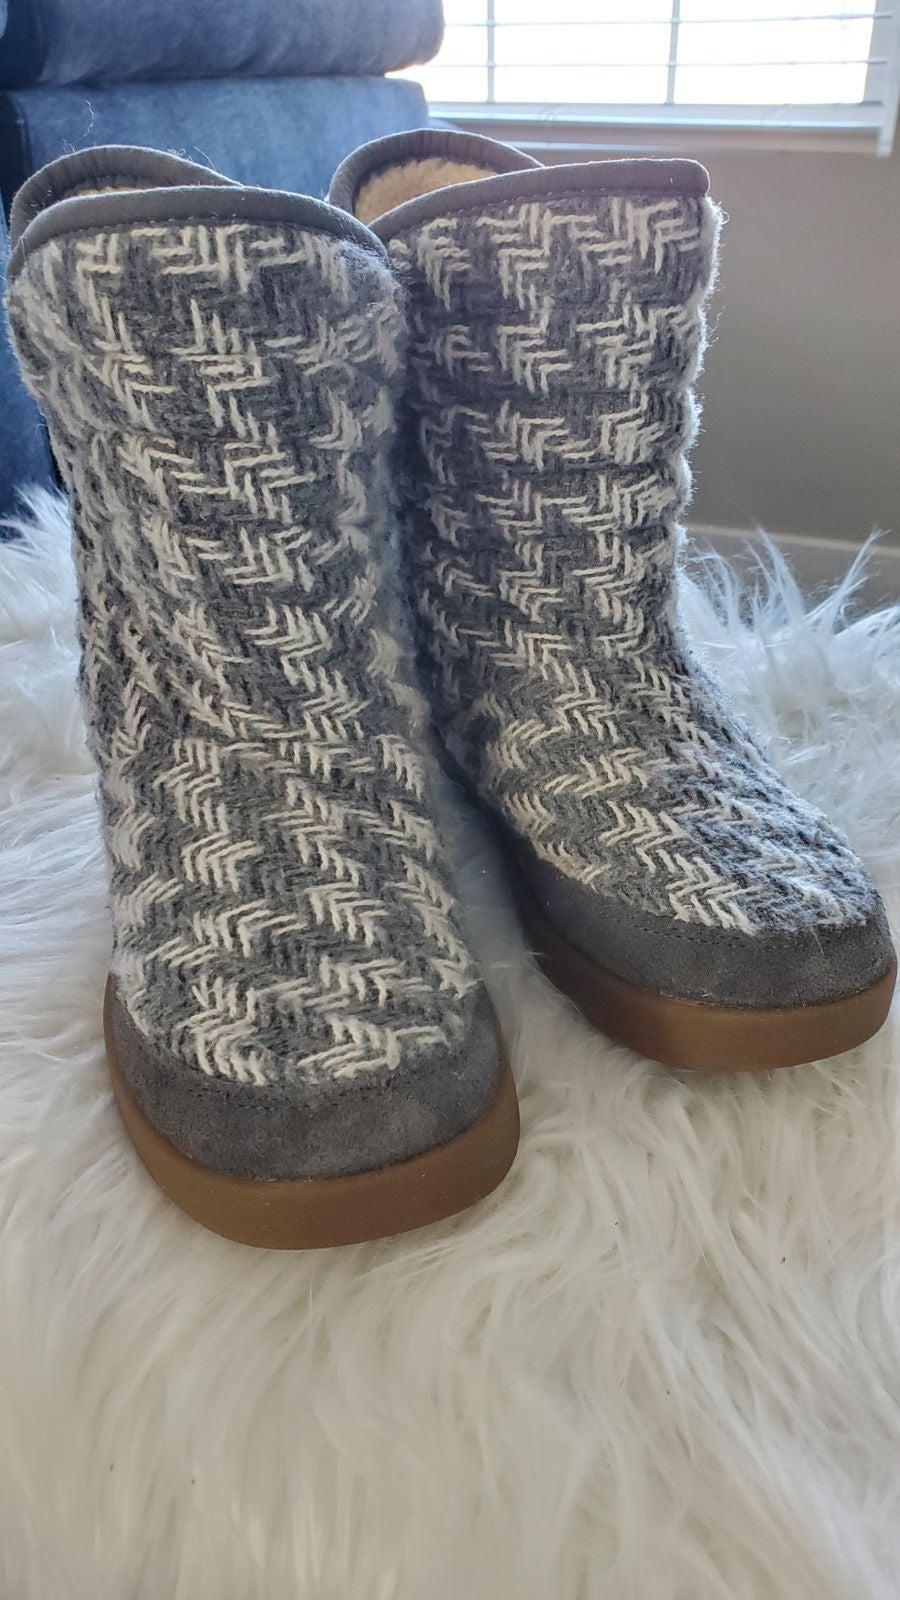 Sanuk Women's Winter Boots